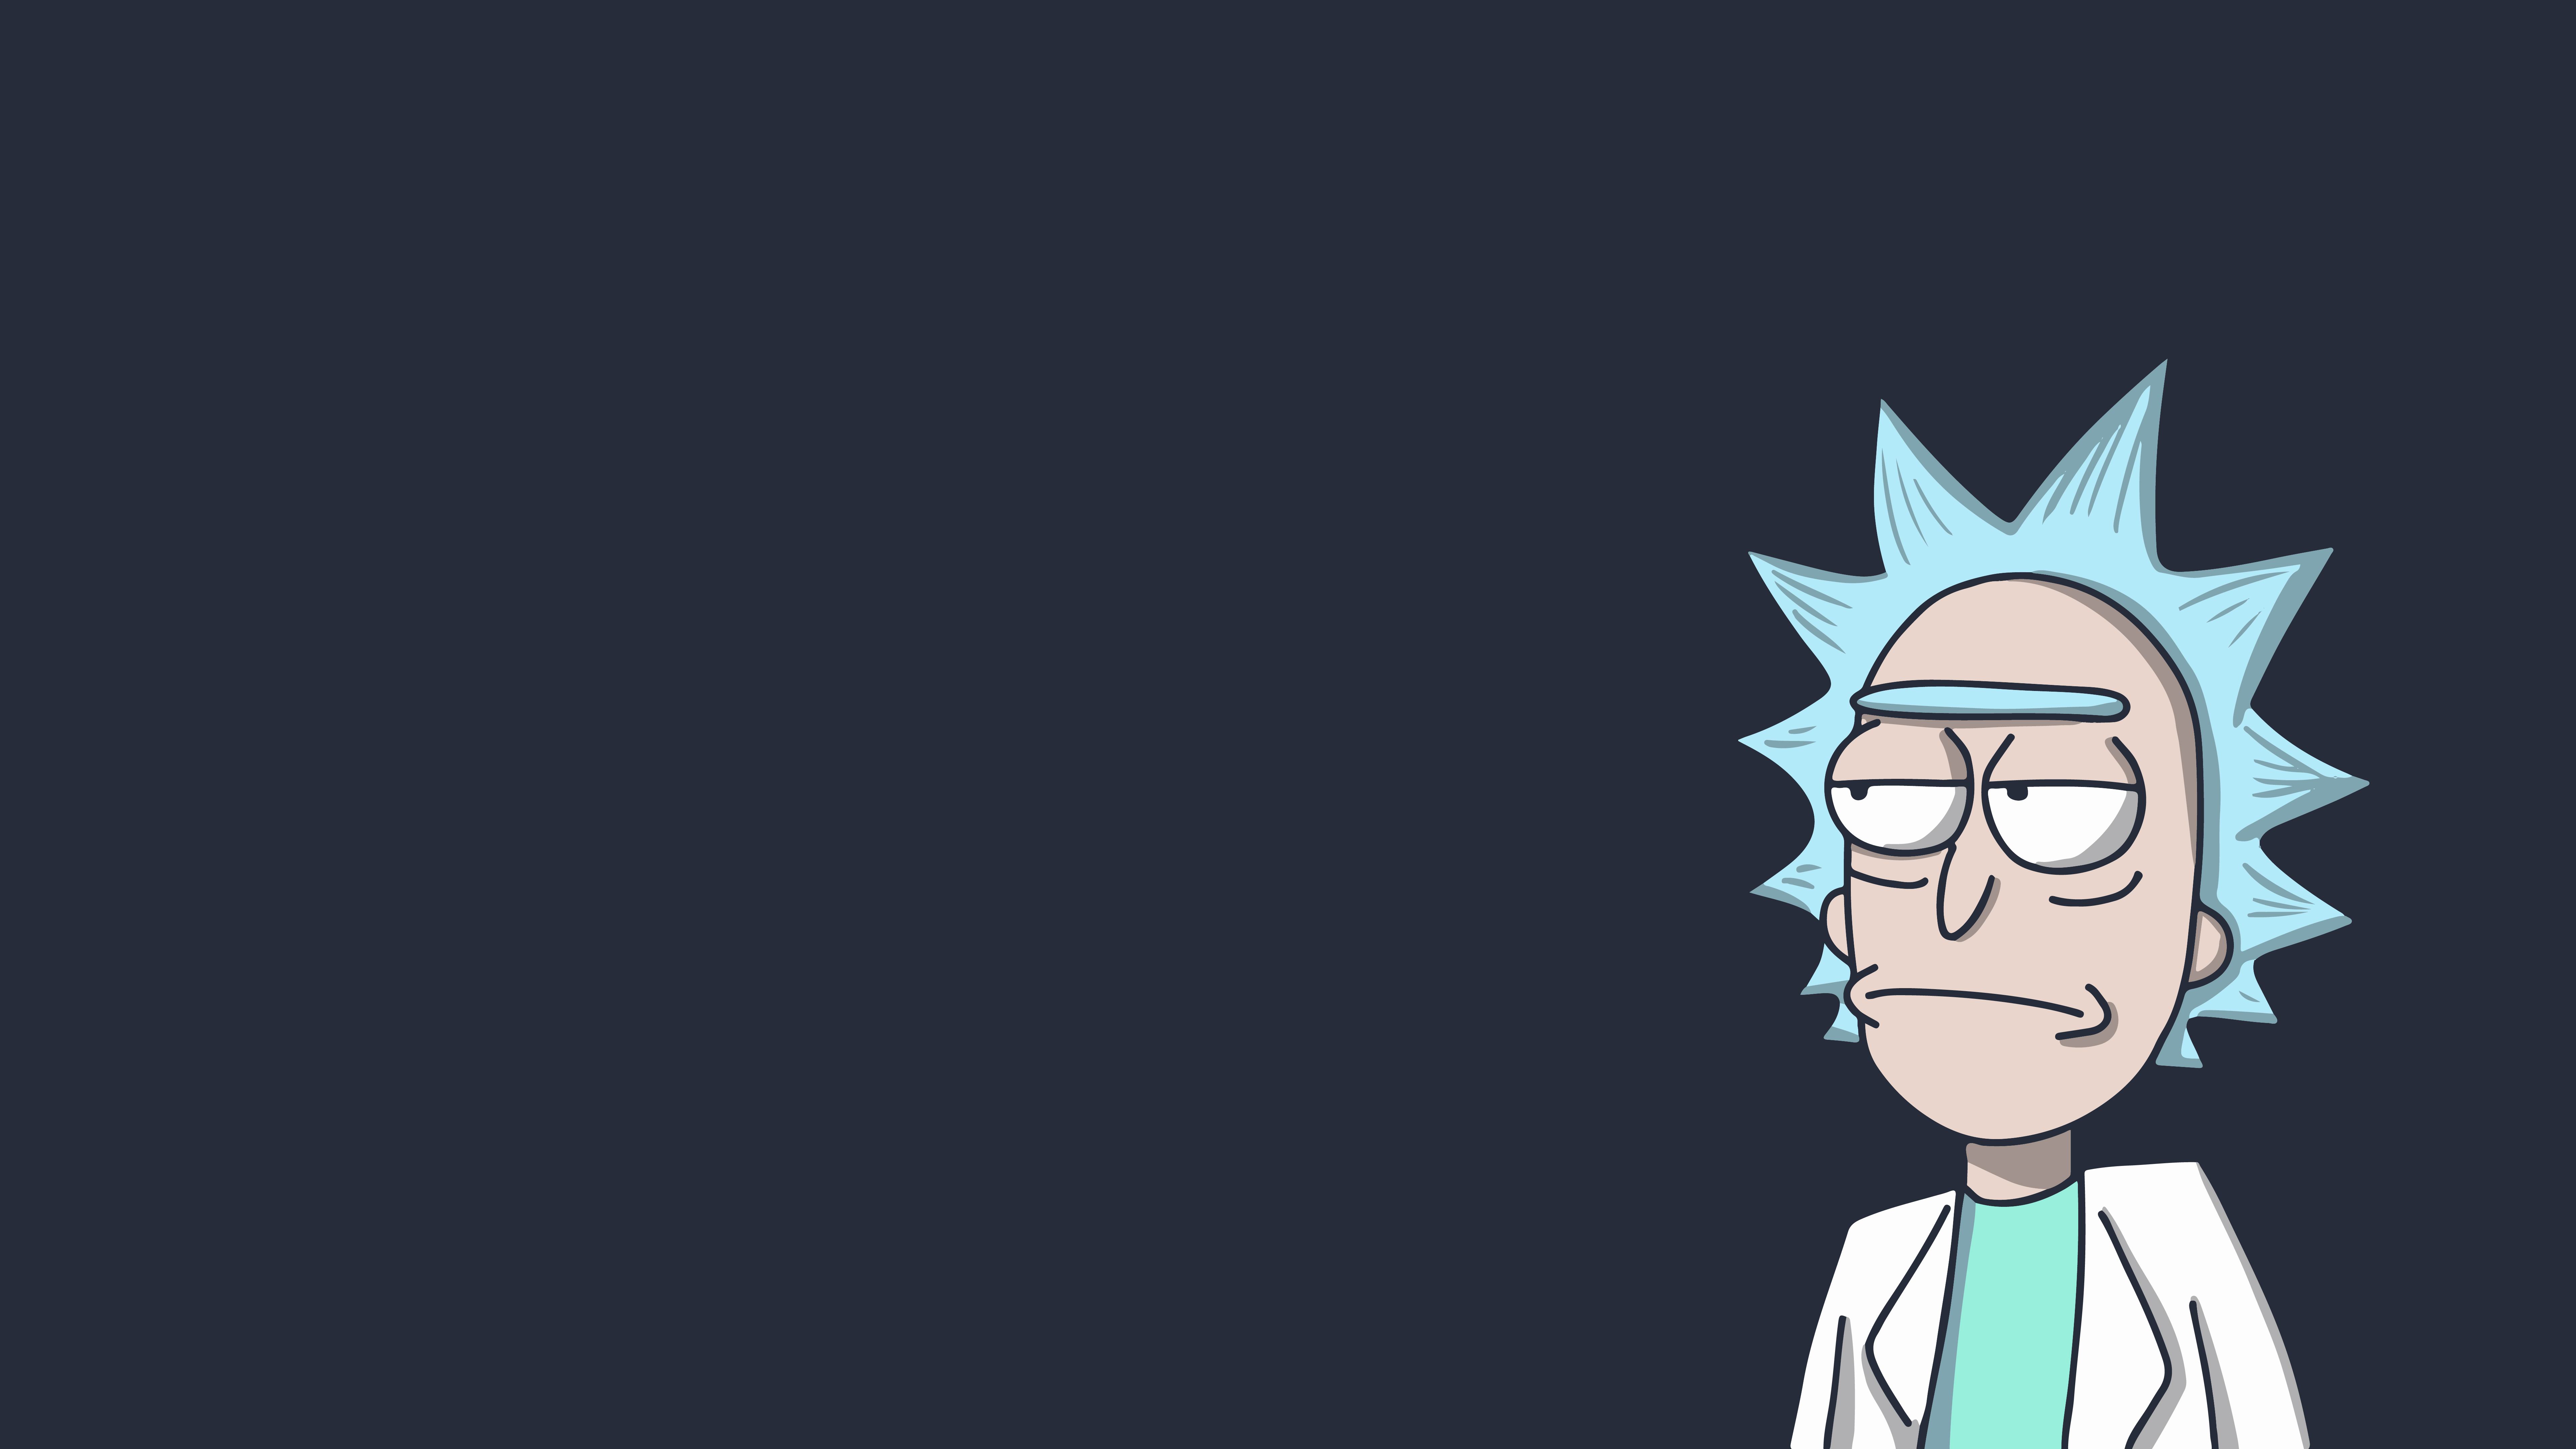 Fondos de pantalla Rick